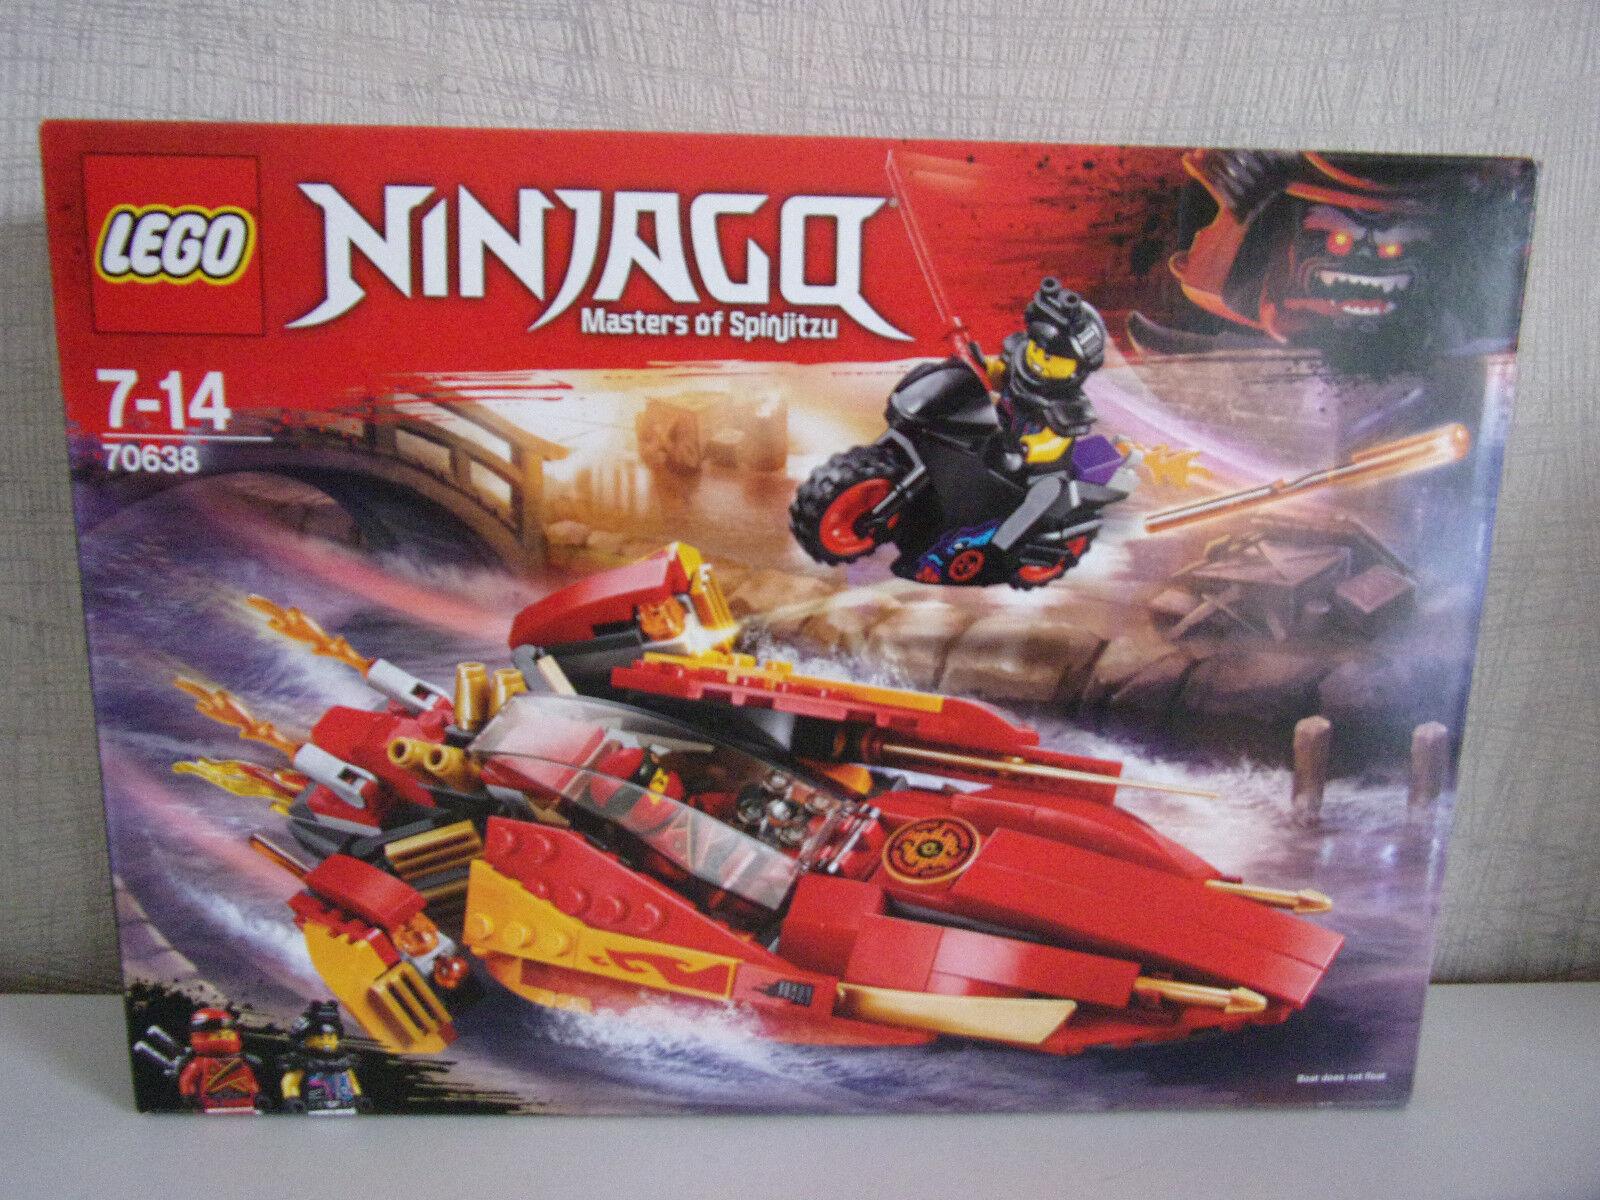 Lego Ninjago 70638 Katana V11 - - - Neuf et Emballage D'Origine ffc84b